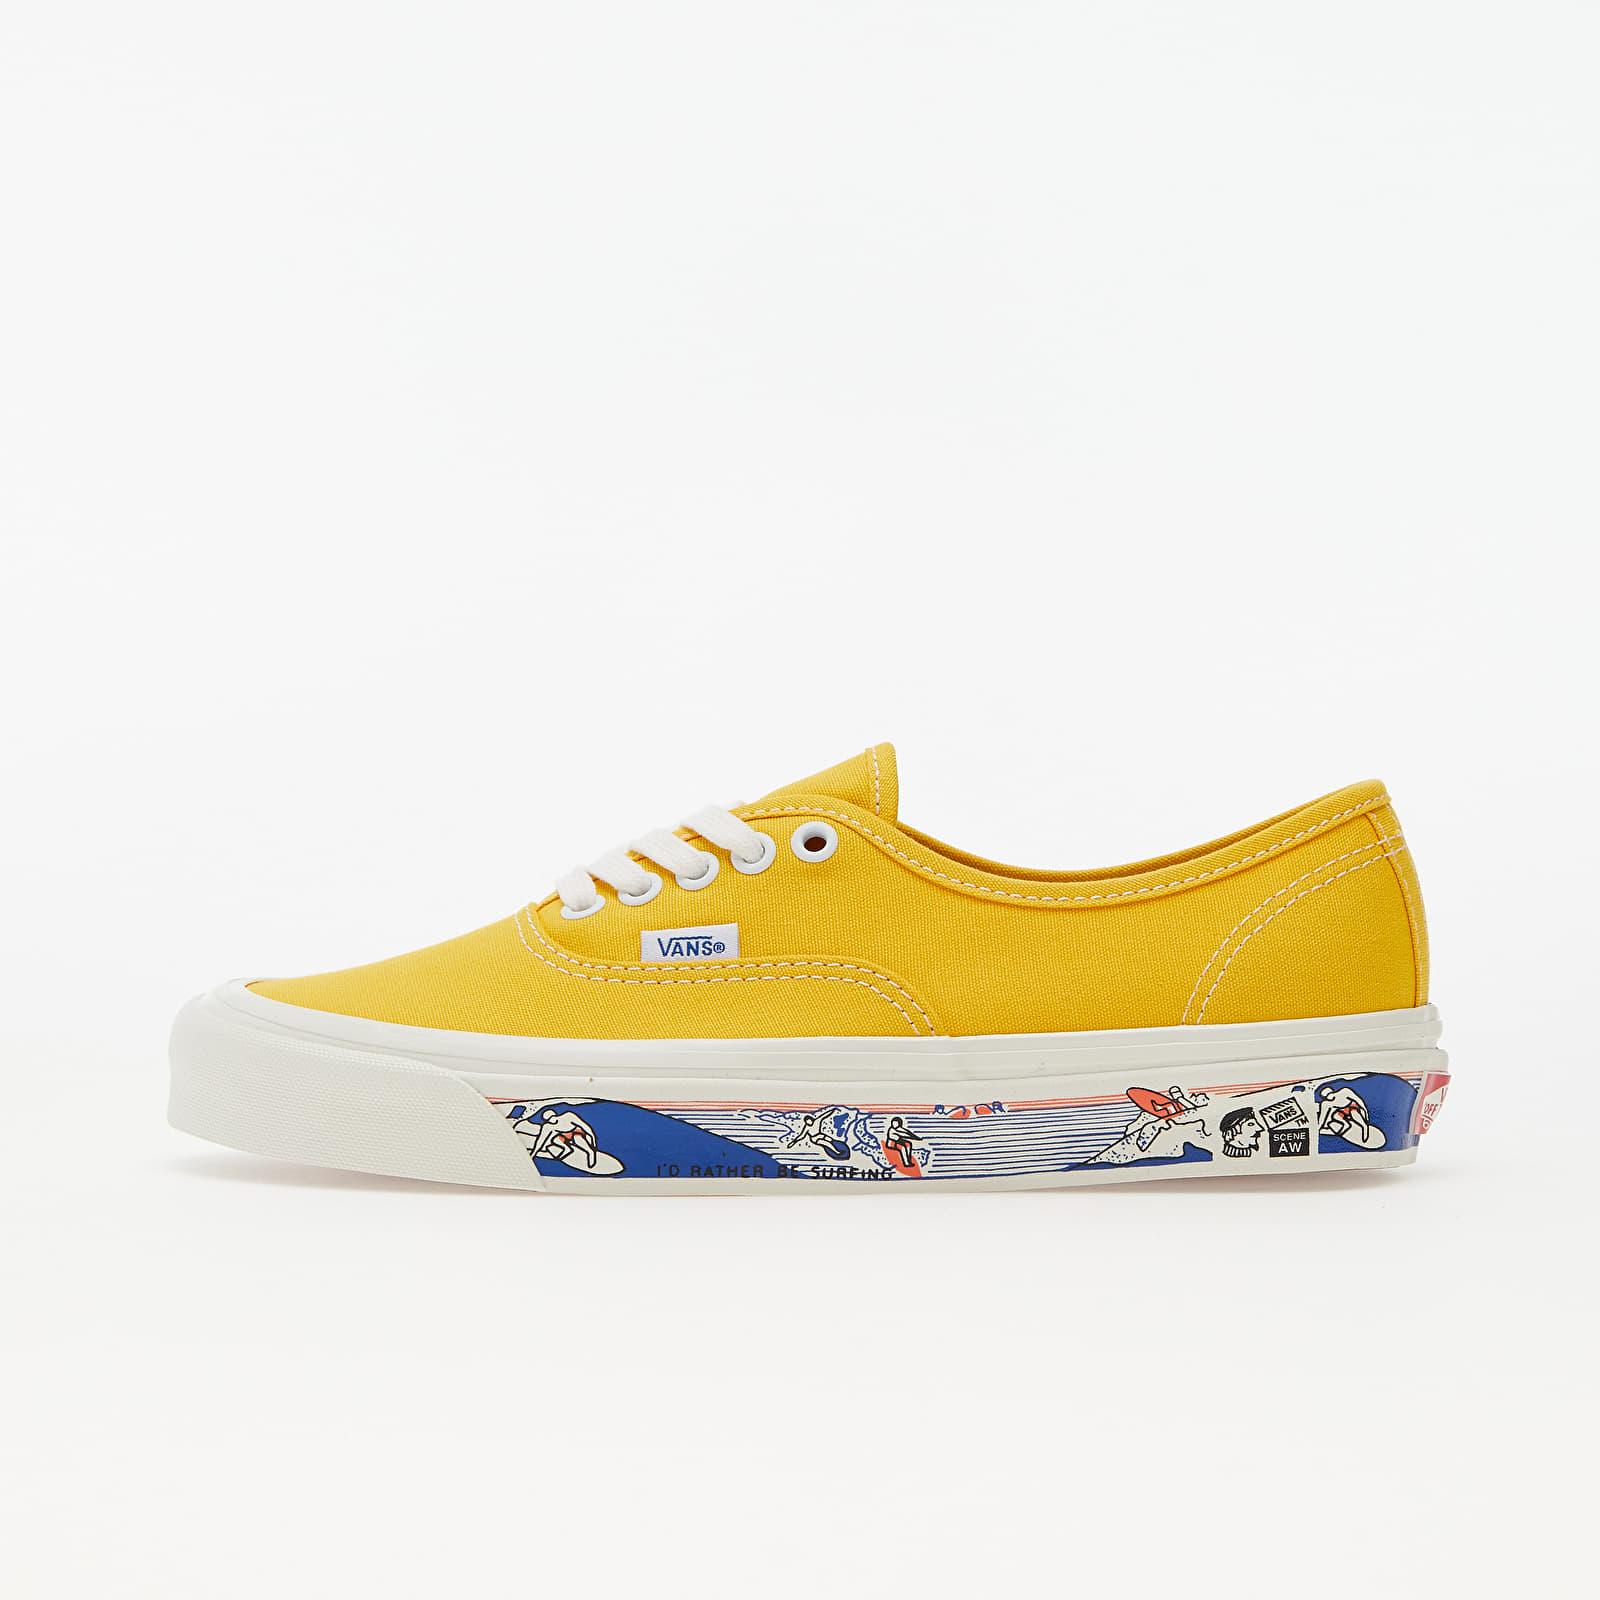 Vans Authentic 44 DX (Anaheim Factory) Yellow   Footshop